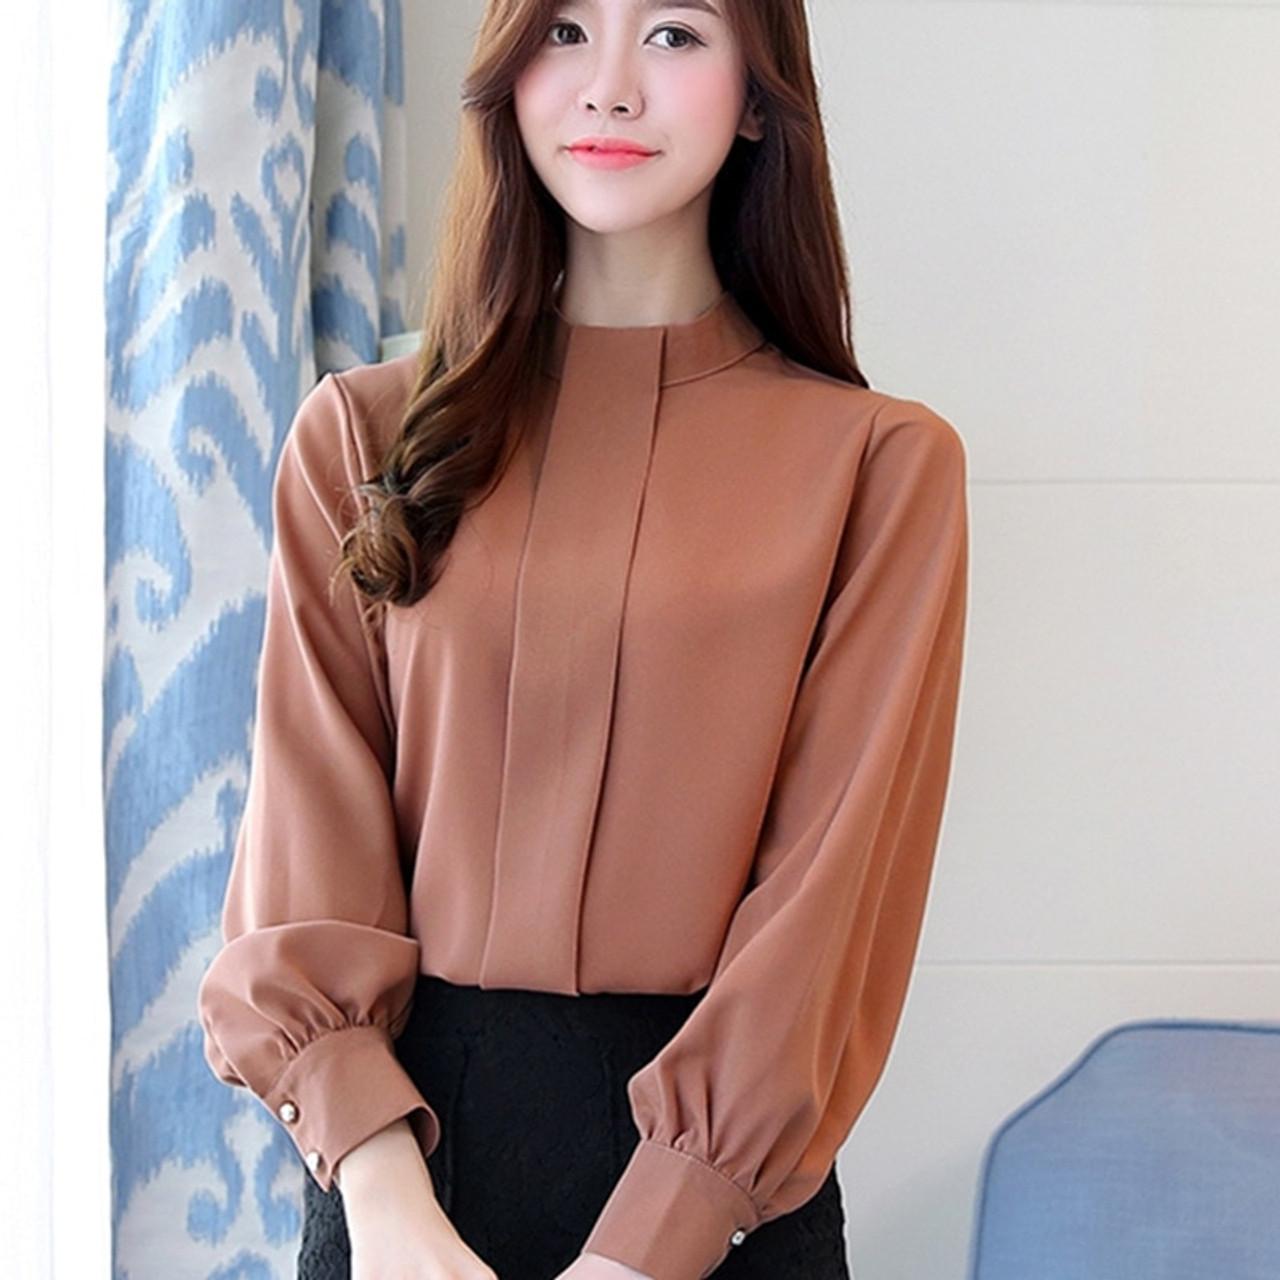 7a6793aafc4 ... New Autumn Women Blouse Long Sleeve Chiffon Blouse Mujer Fashion Ladies  Shirts Casual Blusa Feminino Tops ...